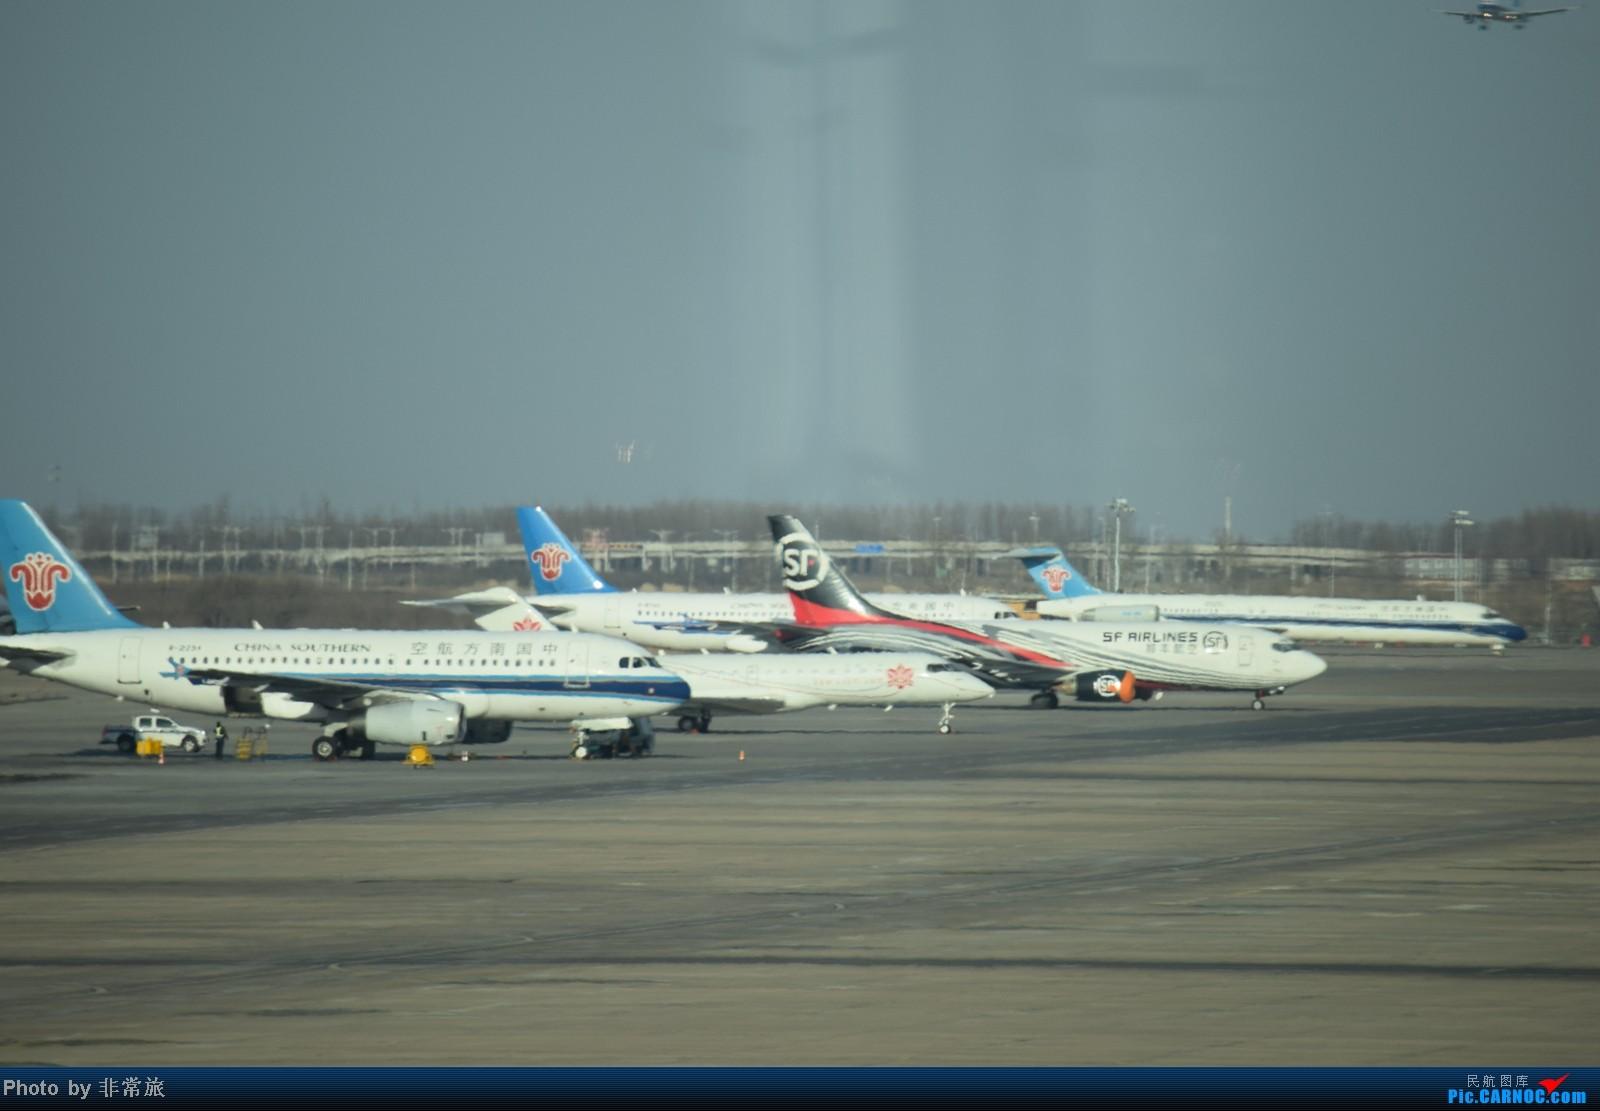 Re:[原创]大年三十除夕夜,三万英尺云霄间。 BOEING 767-300 B-2498 中国沈阳桃仙机场 中国沈阳桃仙机场